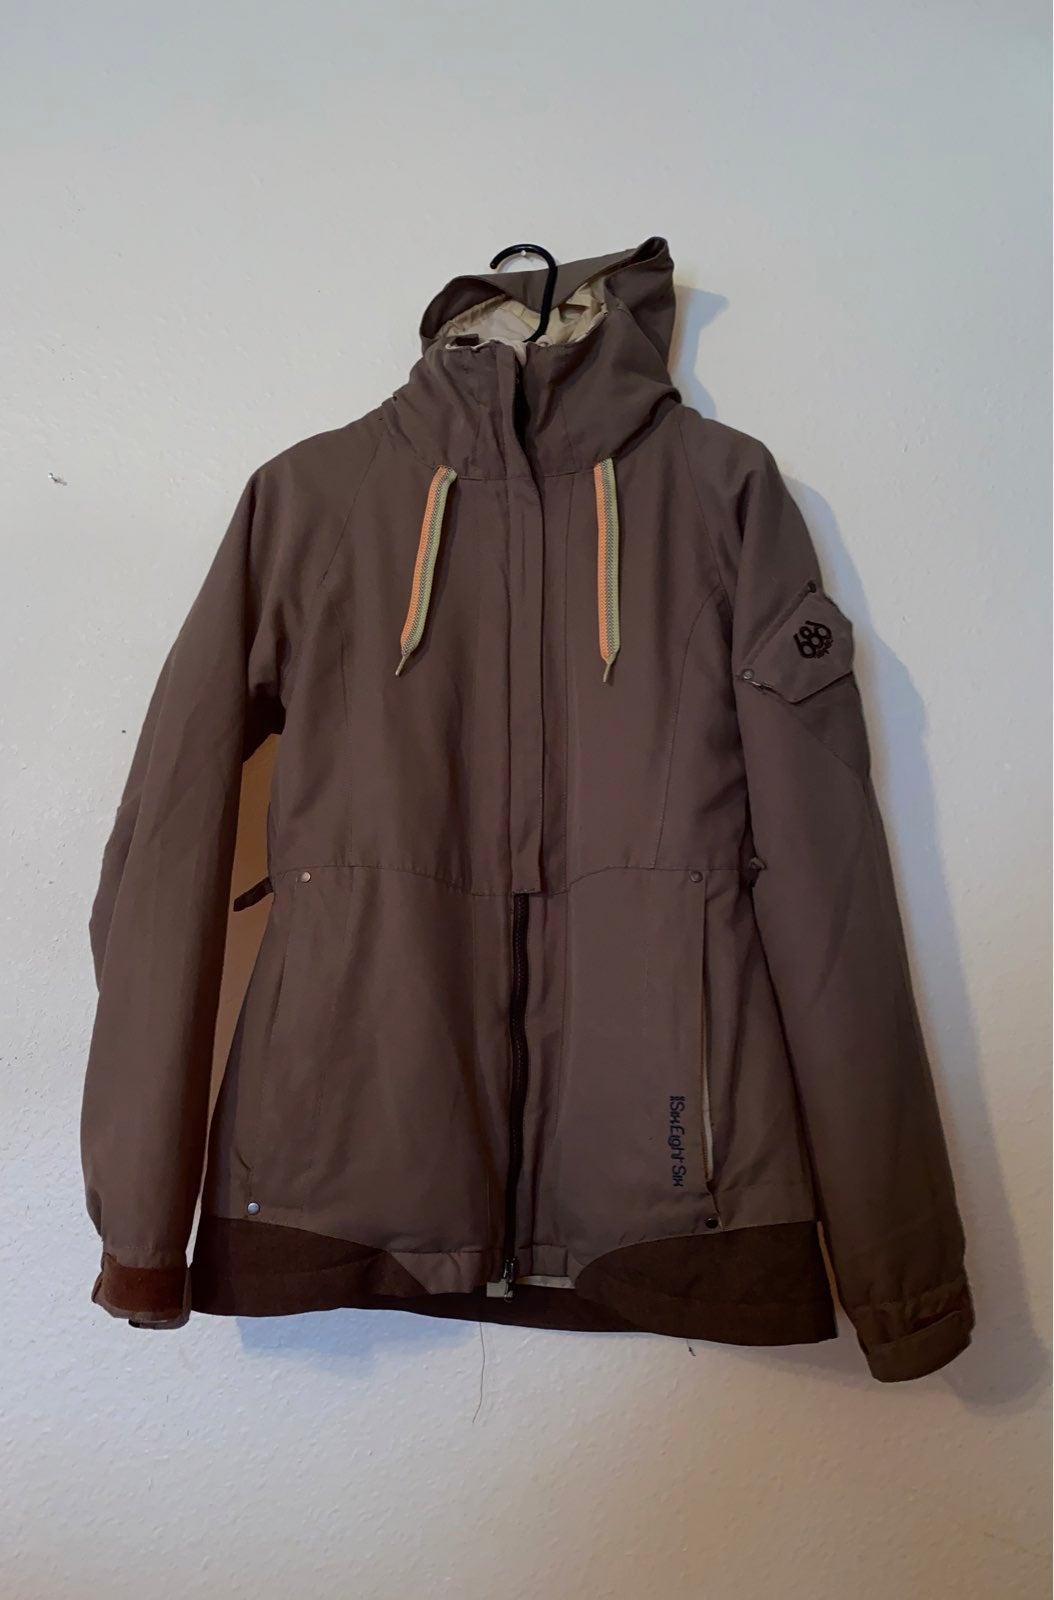 686 mannual snowboarding Jacket